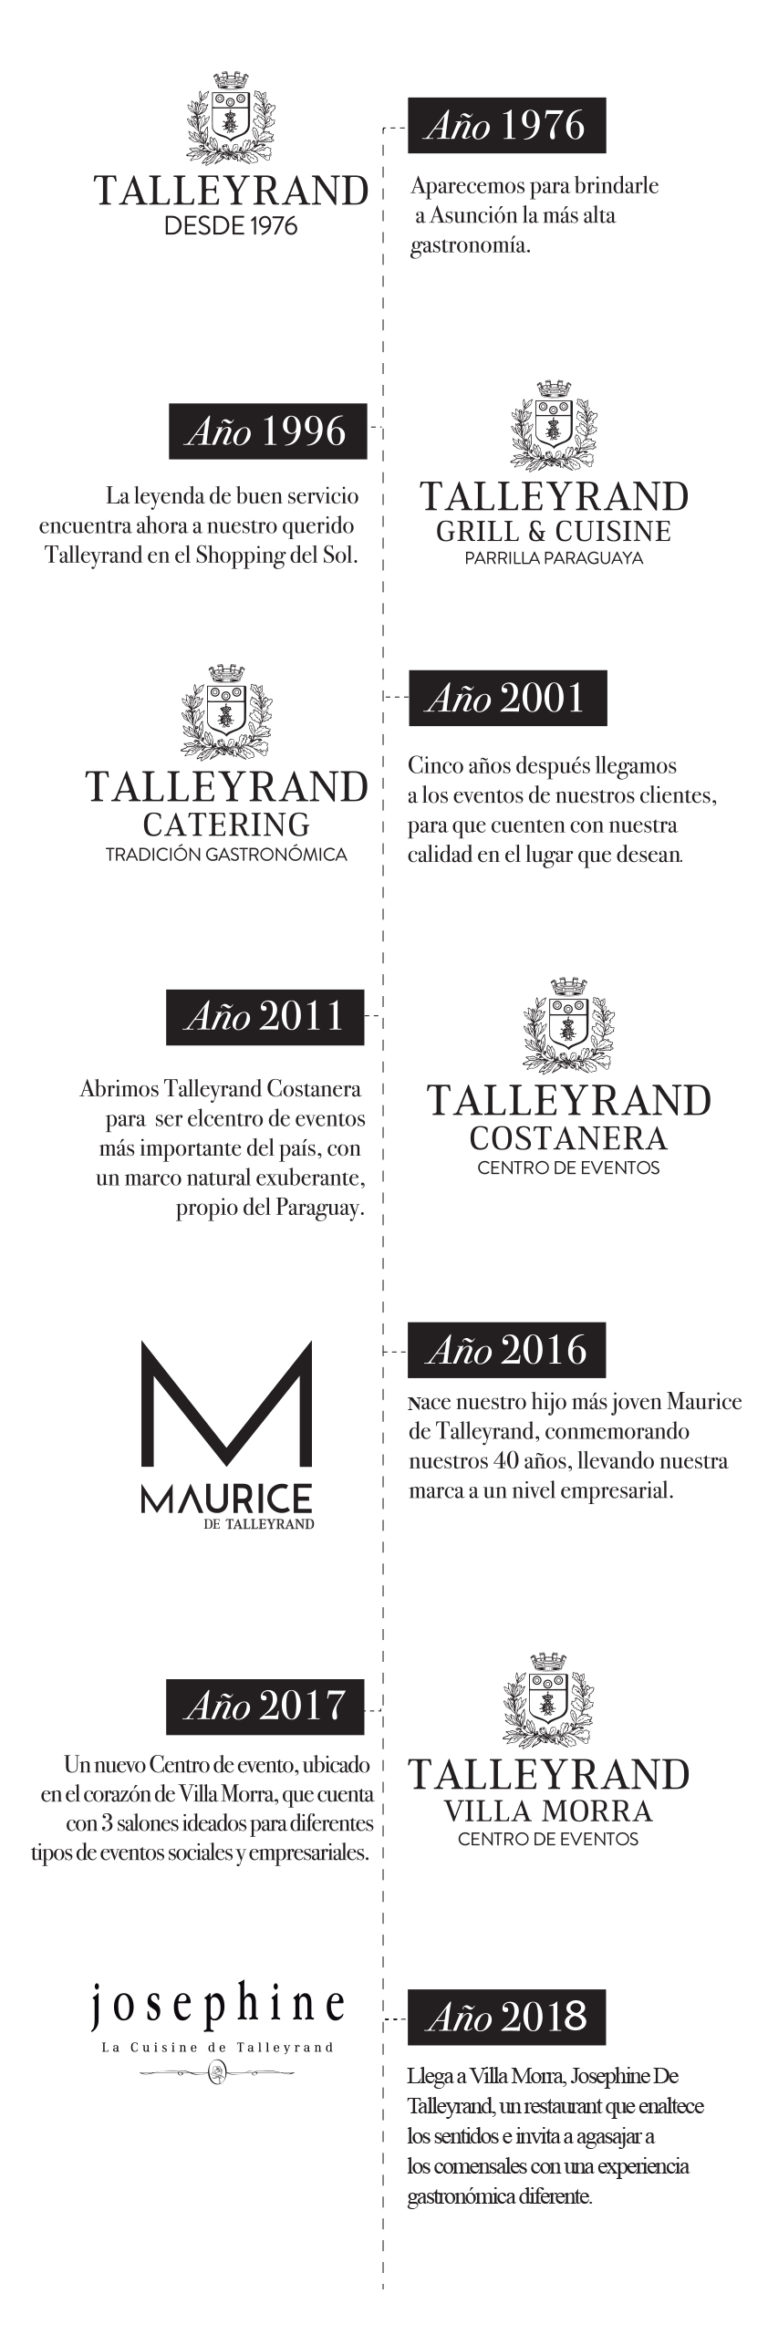 Timeline completa-Talleyrand (002)